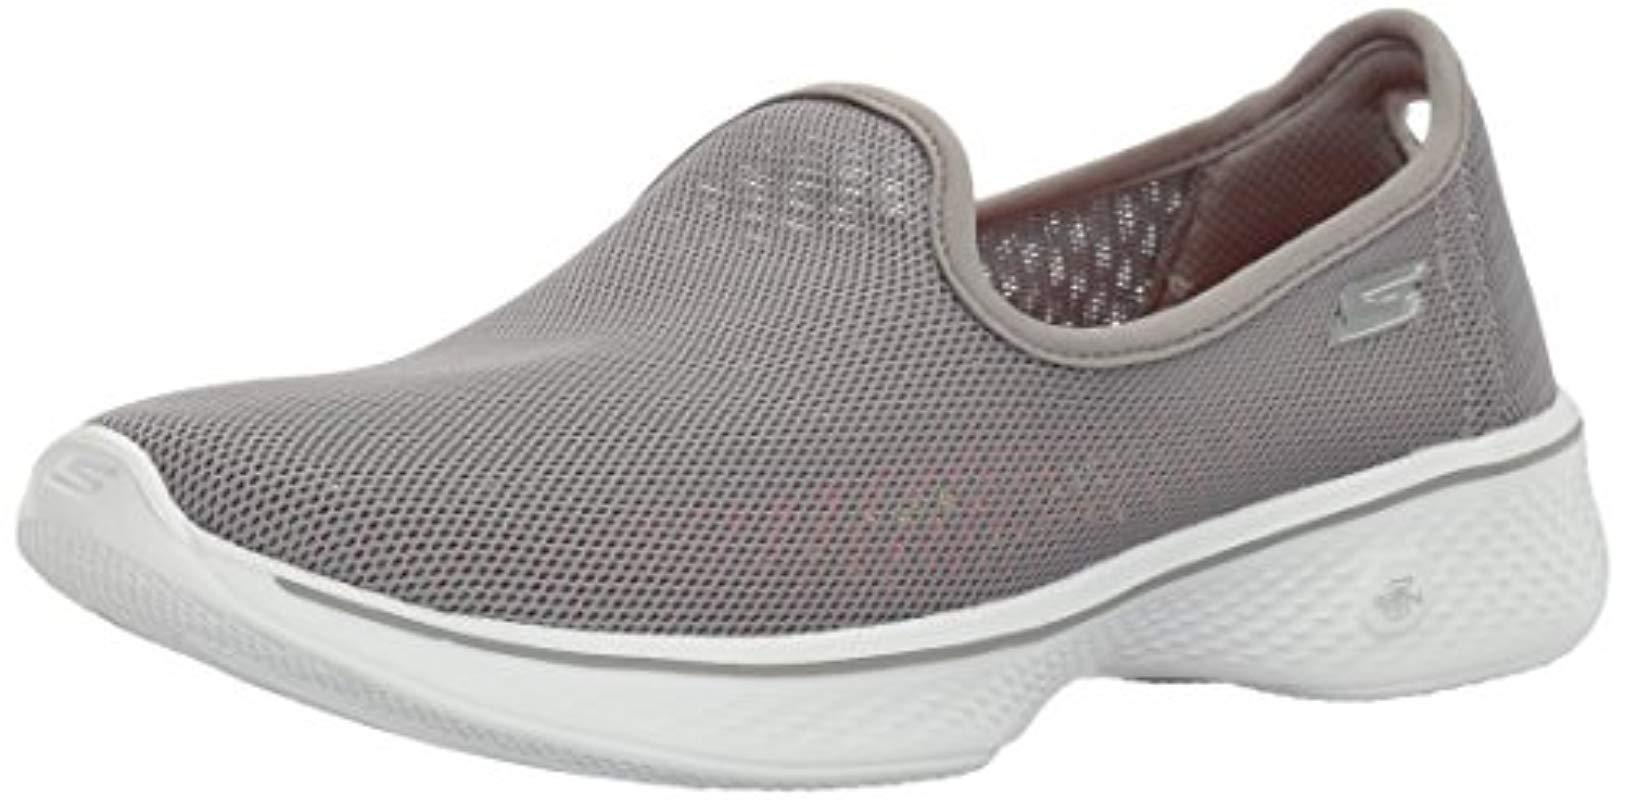 de87141c23b4 Lyst - Skechers Go Walk 4-airy Shoe in Gray